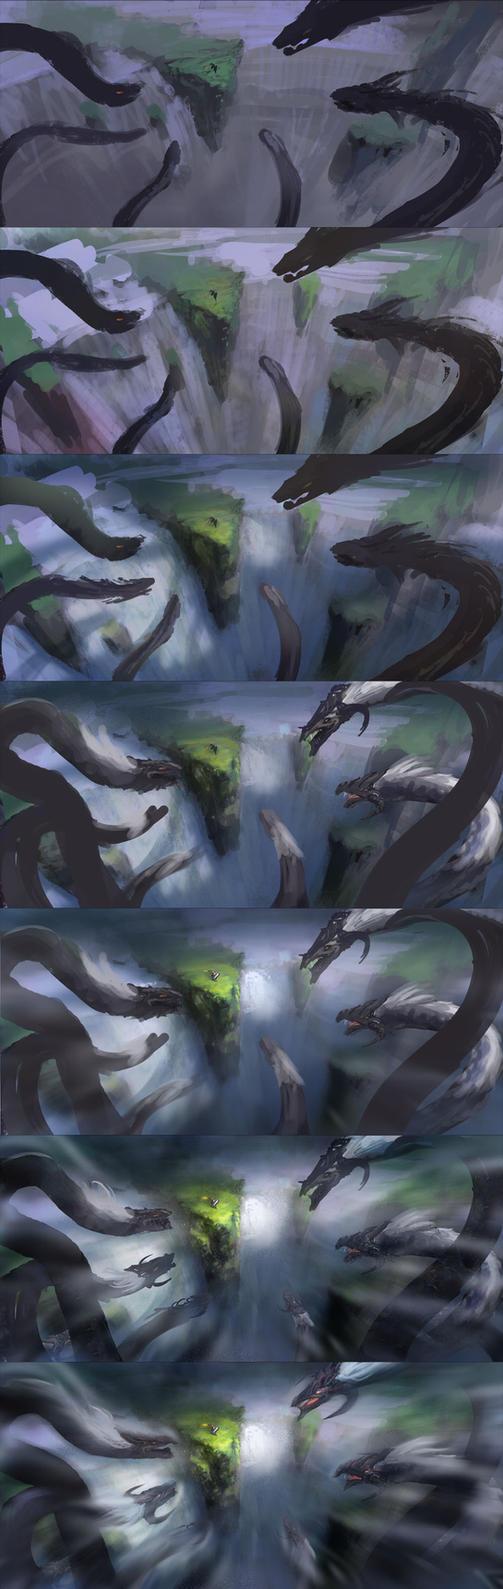 9-head dragon2-1 by wanbao